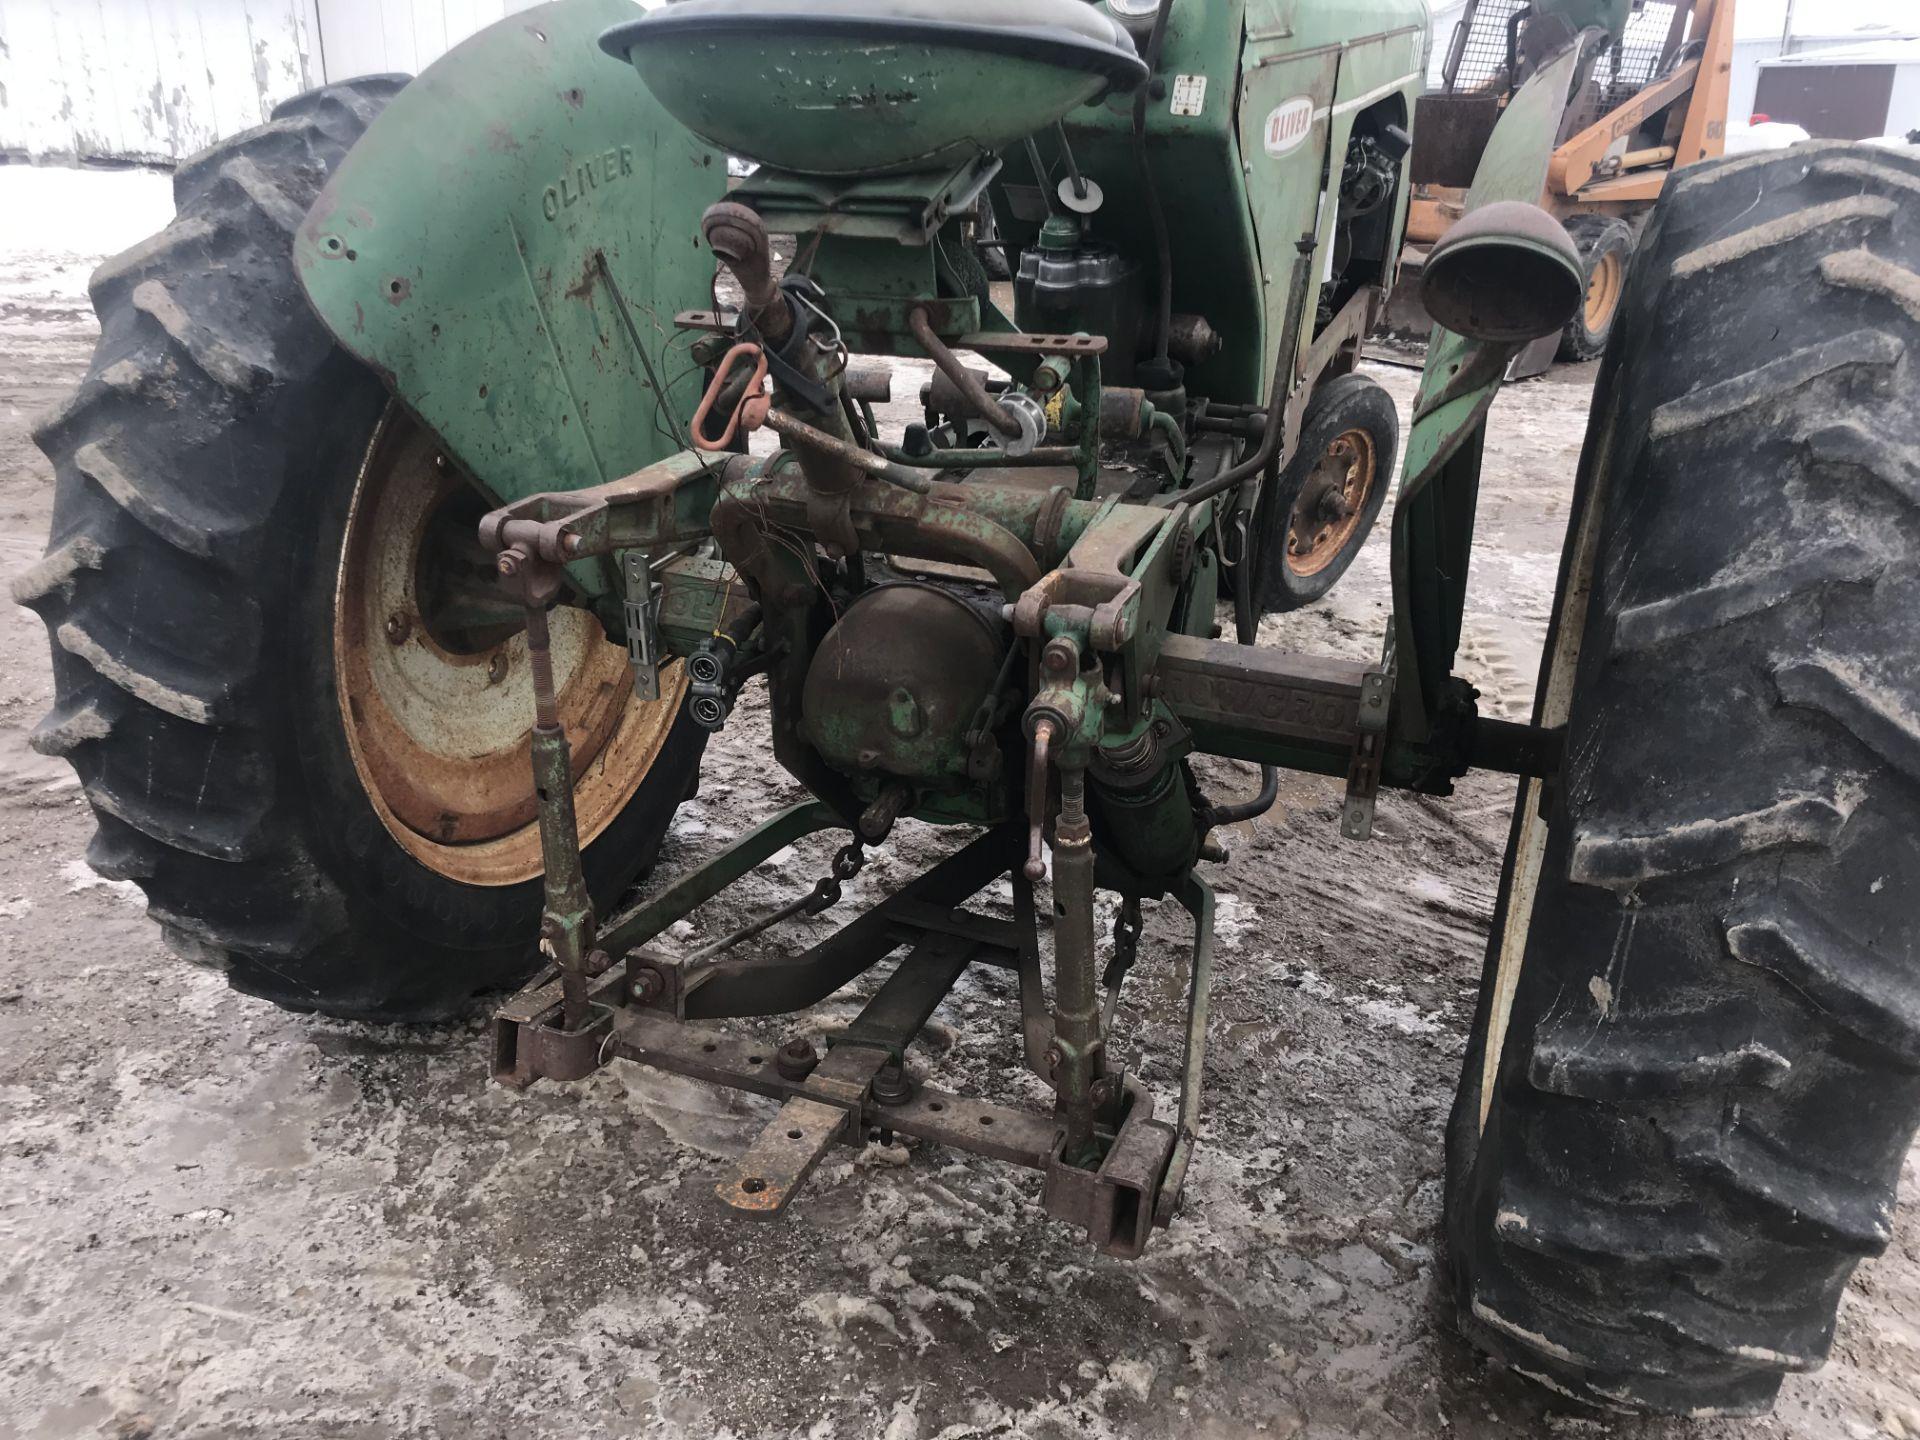 Lot 29 - Mdl.770 Gas S#61-728-721, NF, Factory 2pt/3pt Hitch, Fenders, 13.6x38 (good rubber) Orginal